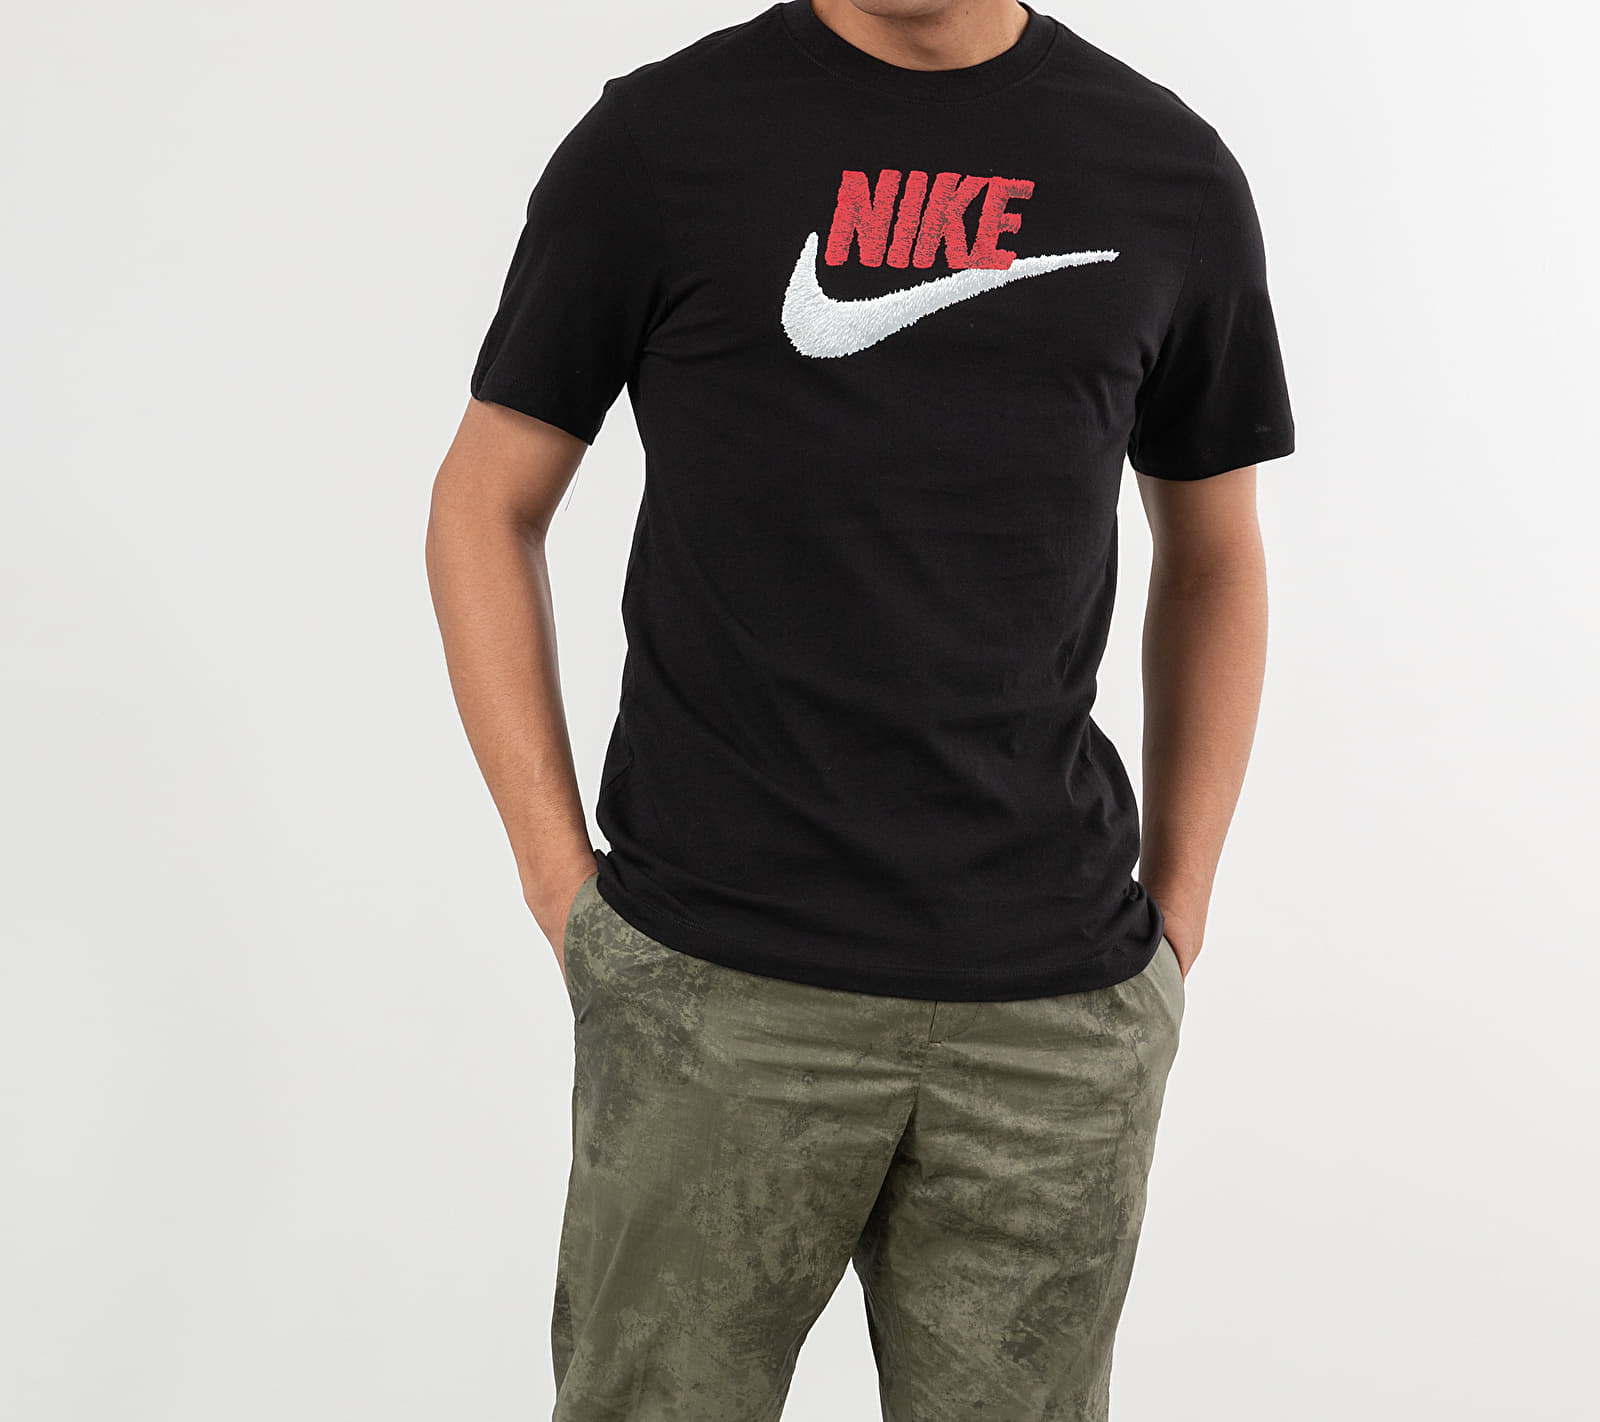 Nike Sportswear Tee Black/ University Red/ White S-T